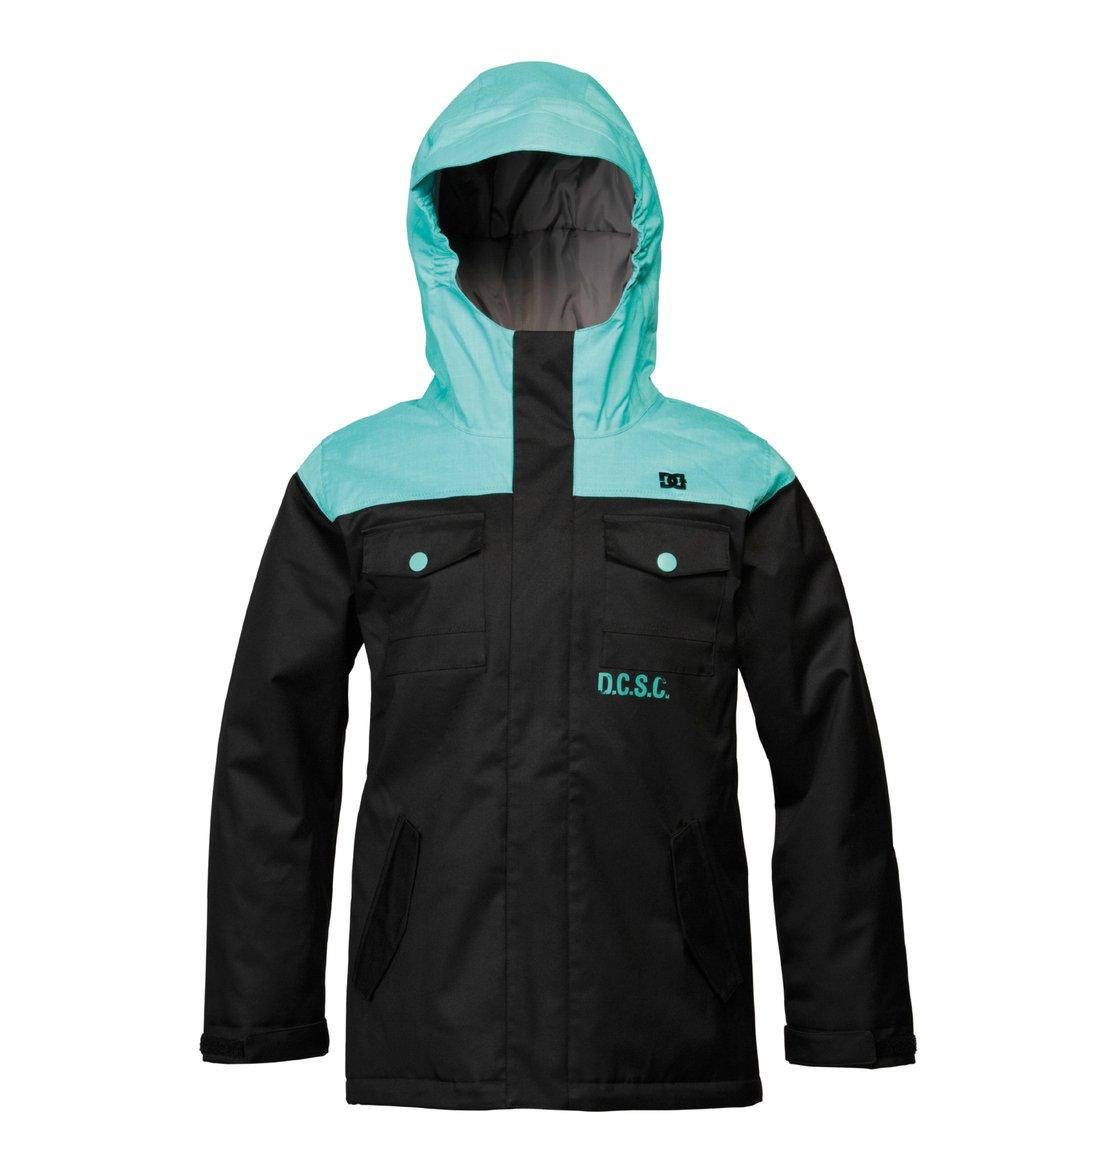 948c69ad2 100% top quality 7d24e d242b servo snowboard jacket for kids boys ...